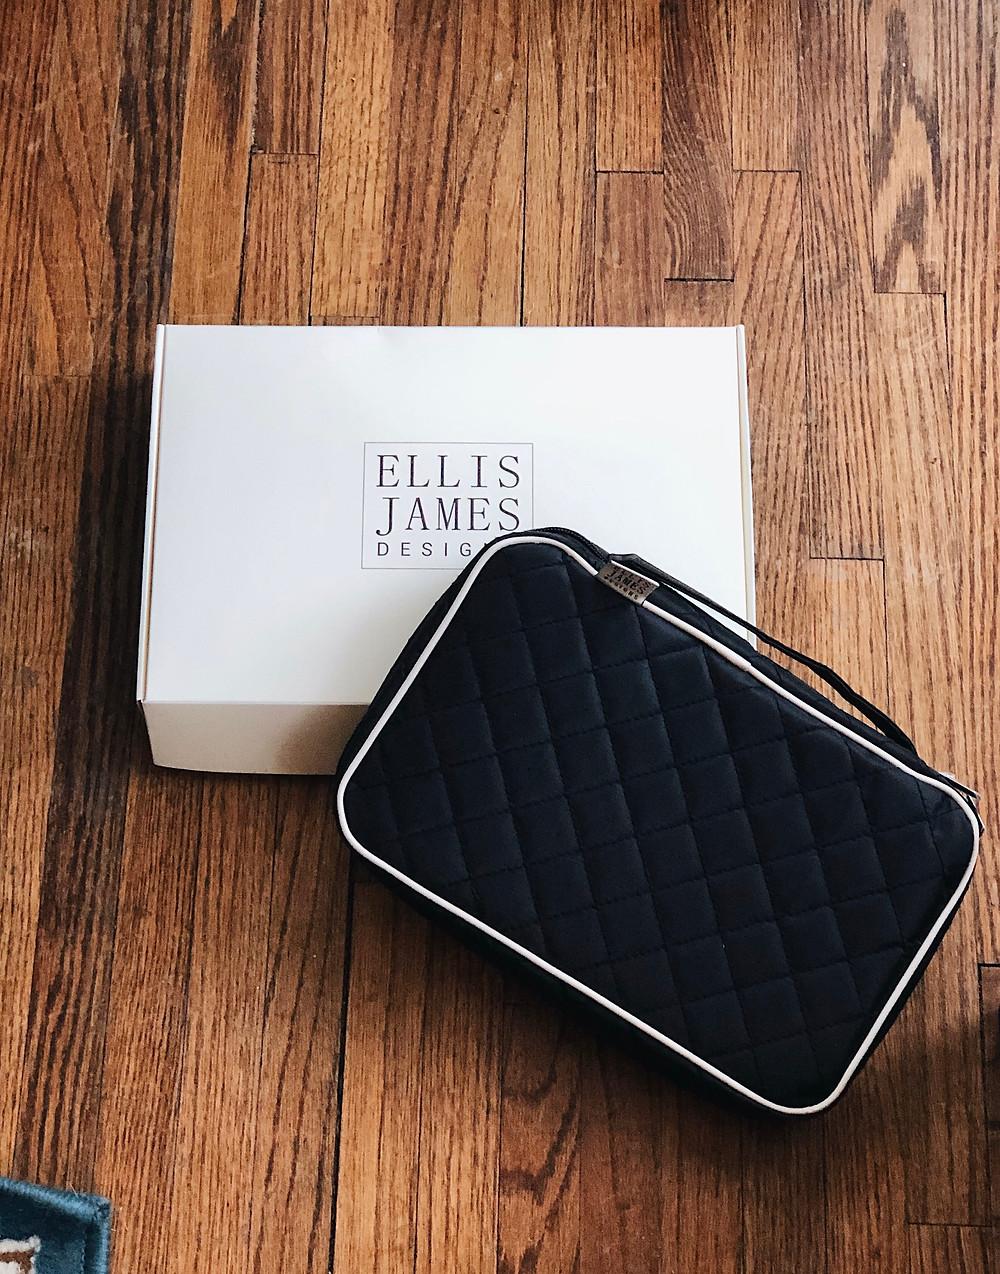 Ellis James Designs Makeup Brush Bag